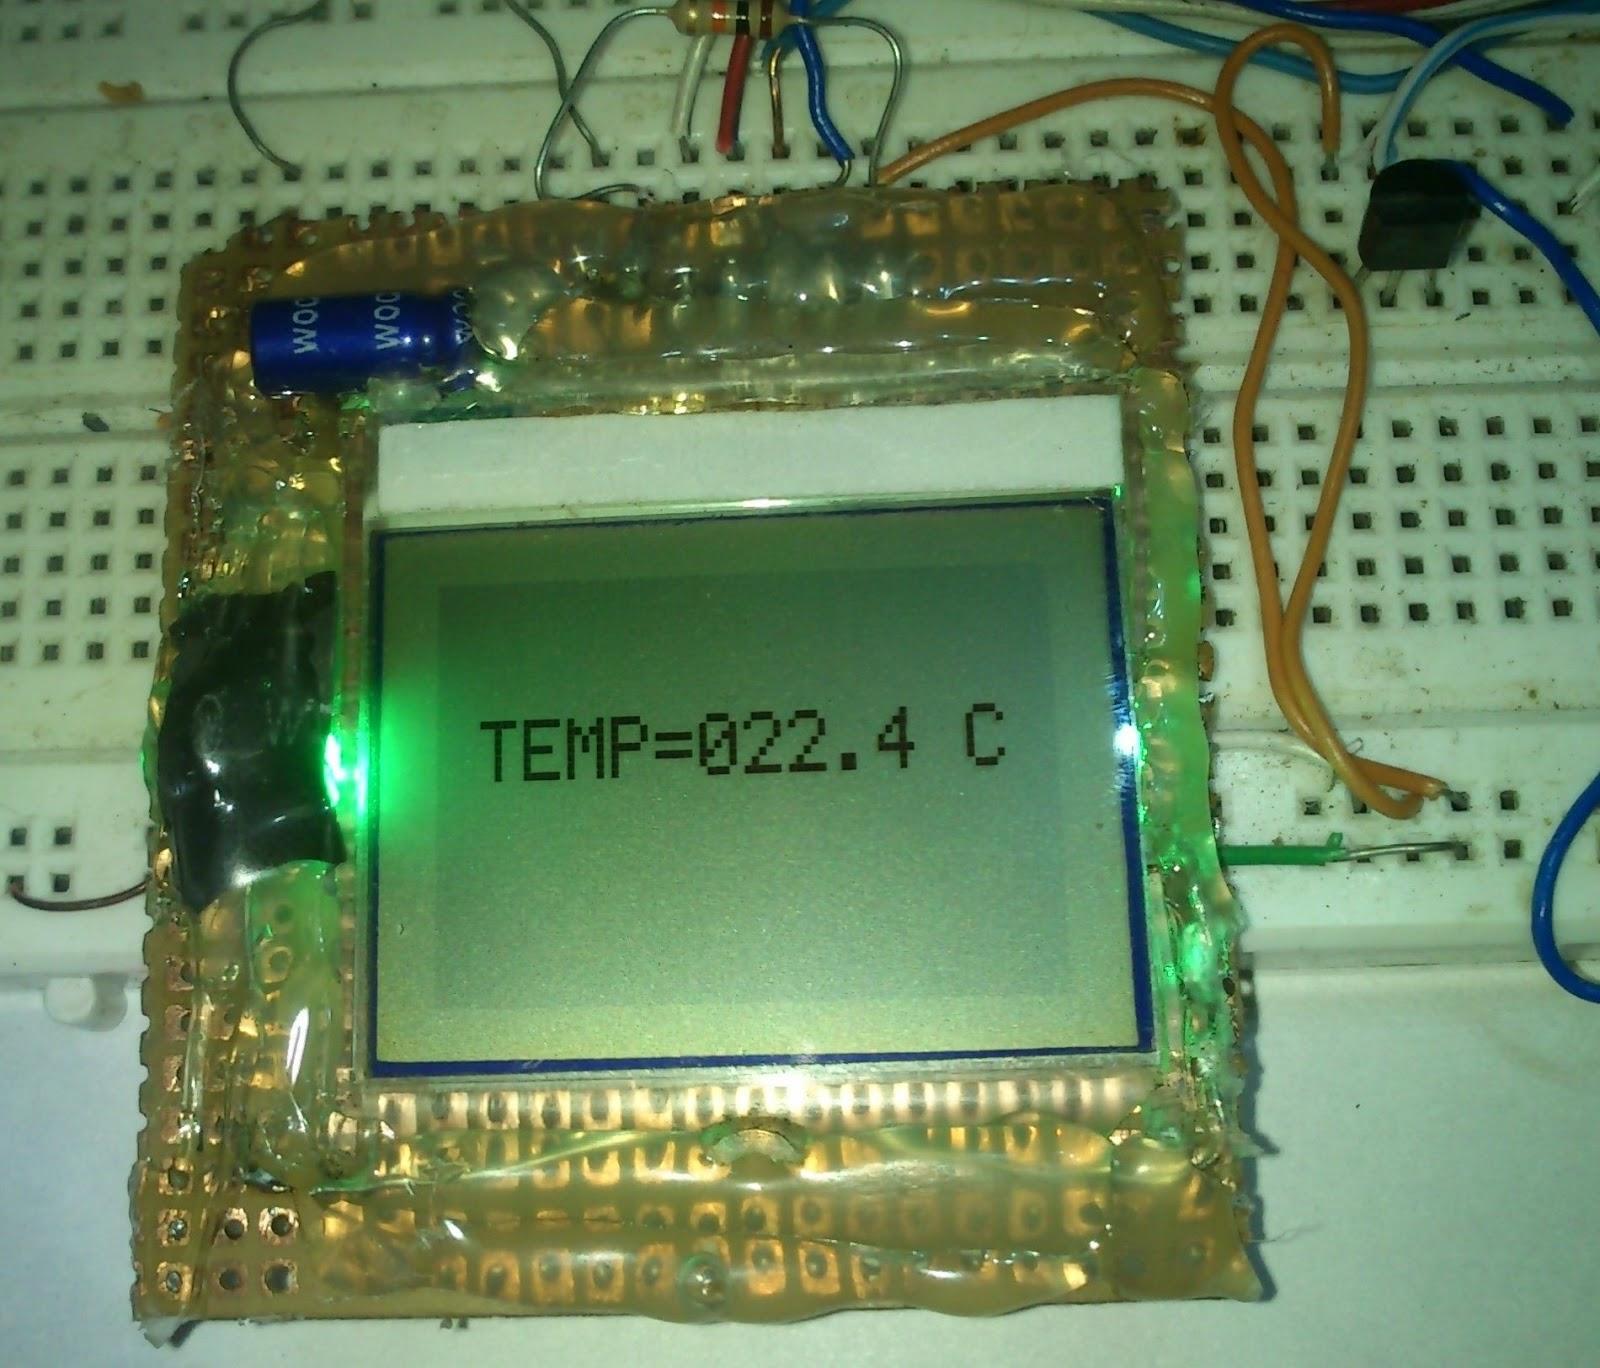 Embedded Engineering : 2011